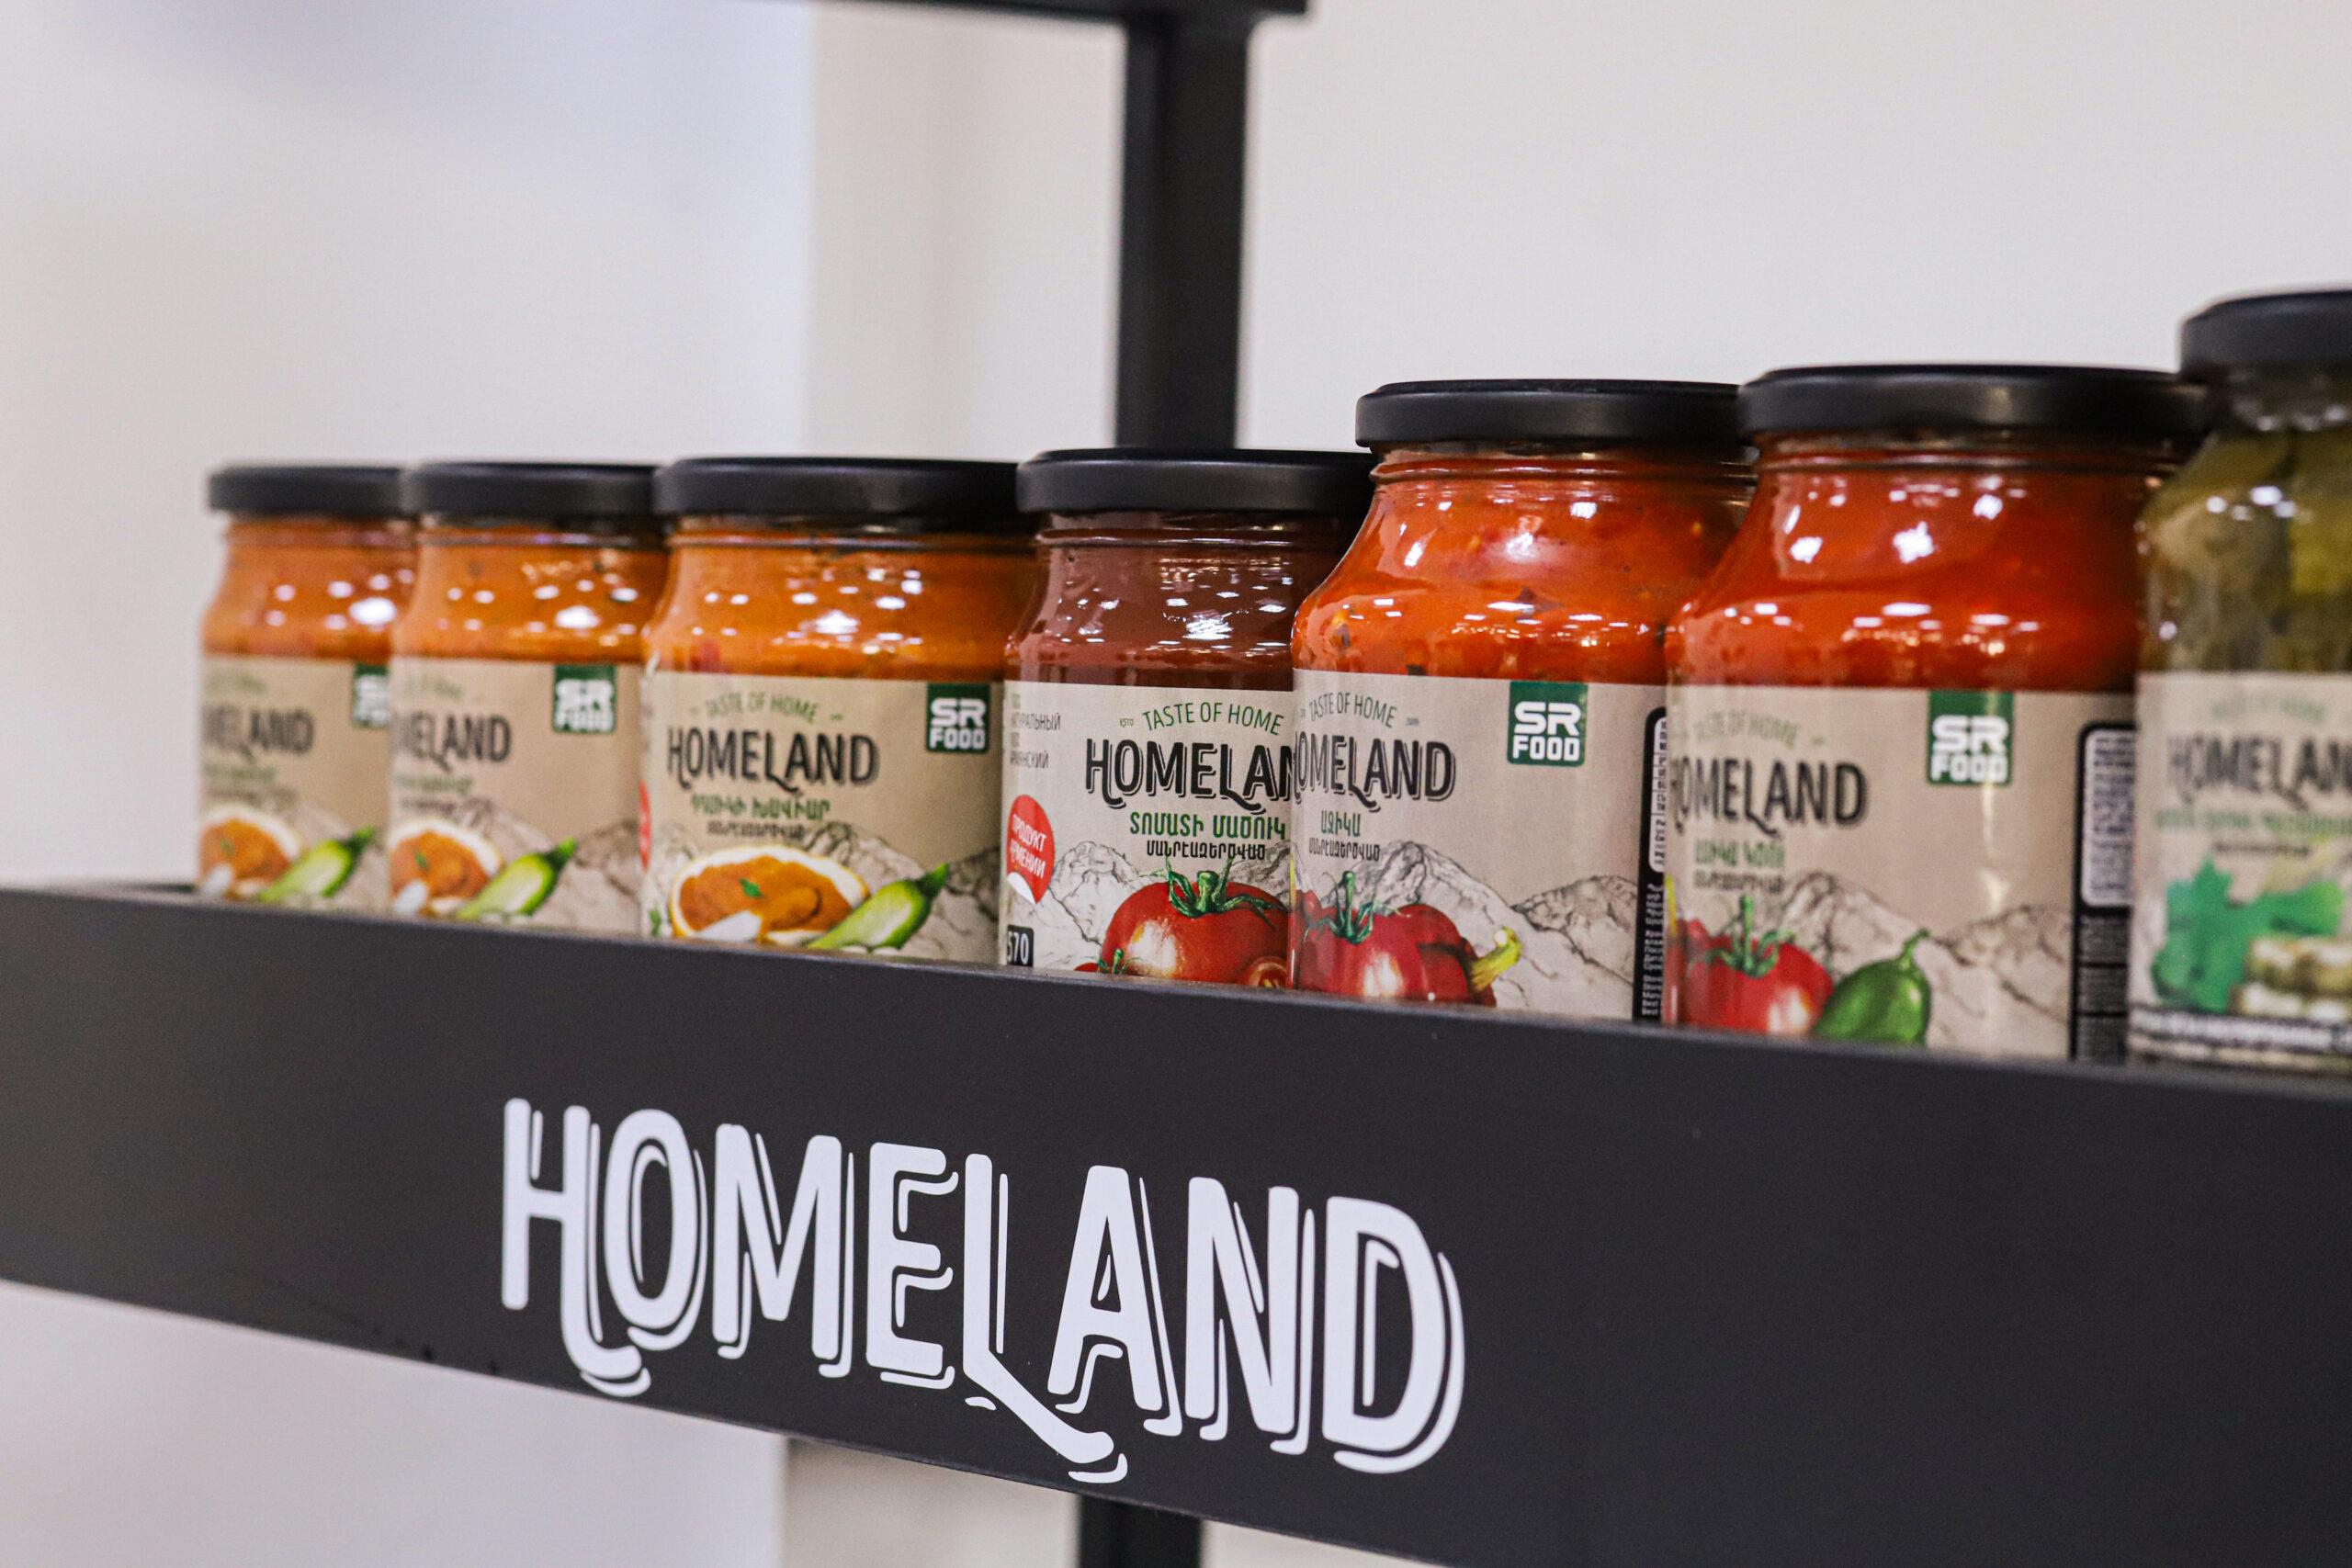 Homeland Expo: